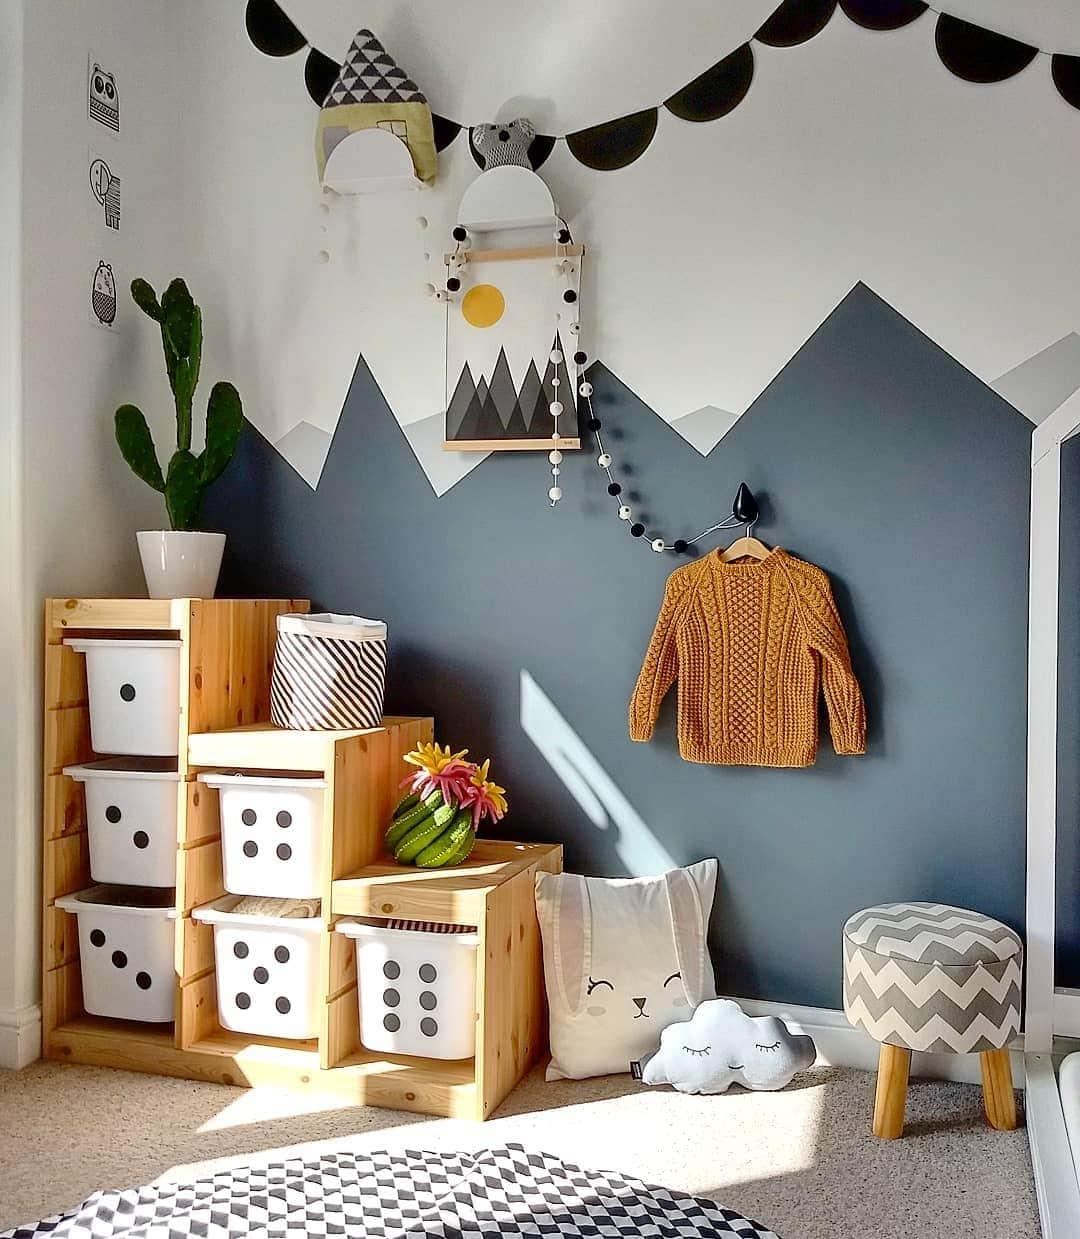 IKEA Trofast bins